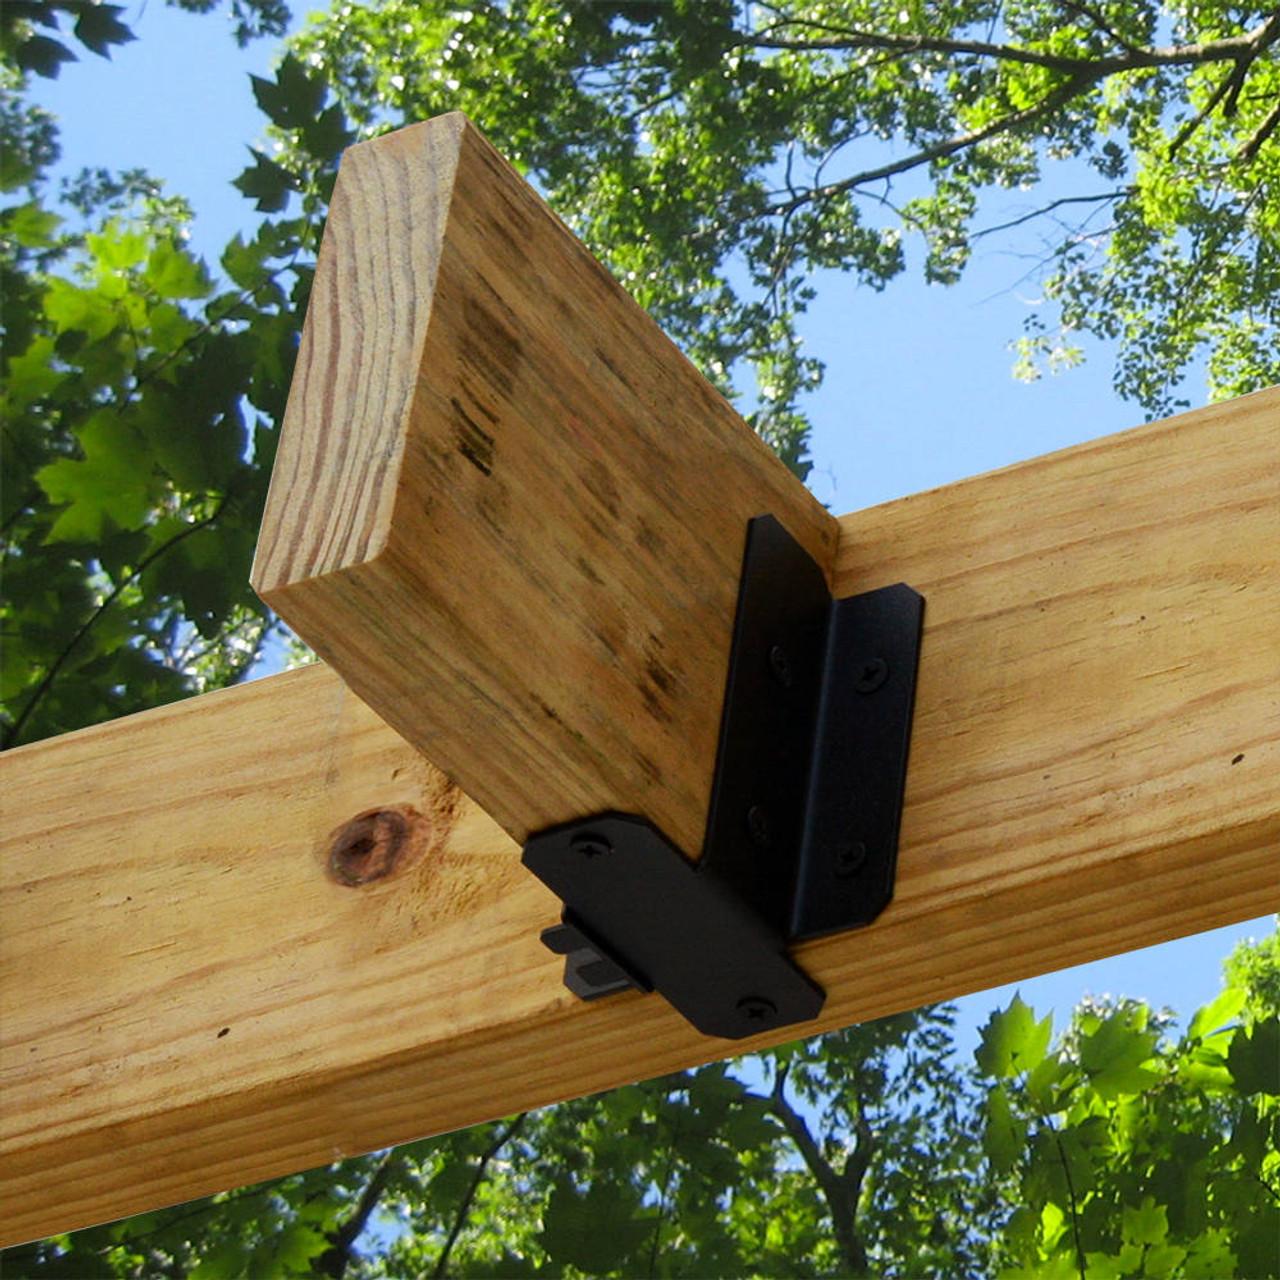 OZCO Ornamental Wood Ties (OWT) Joist Hanger Tab Securing a Wood Joist on a Pergola